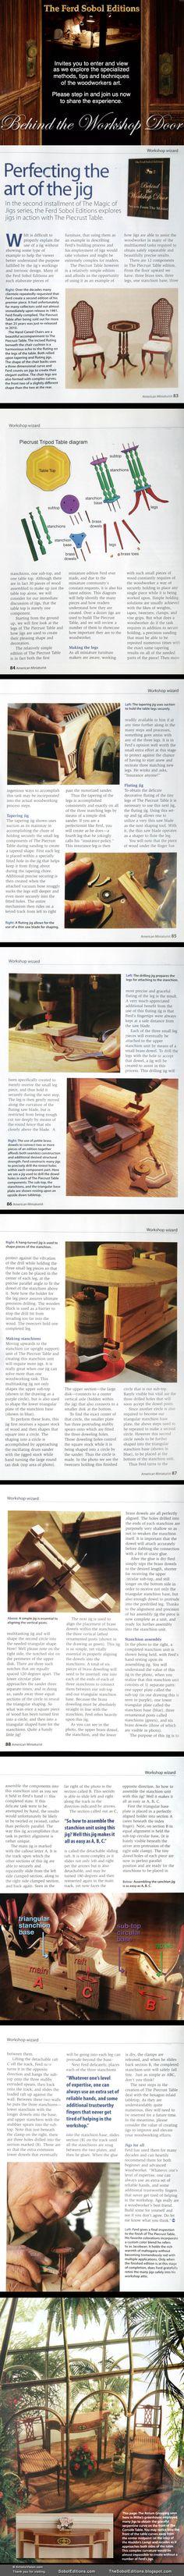 Watch Ferd Sobol master miniature furniture builder create his famous Piecrust Table. Visit the website SobolEditions.com and the BLOG thesoboleditions.blogspot.com